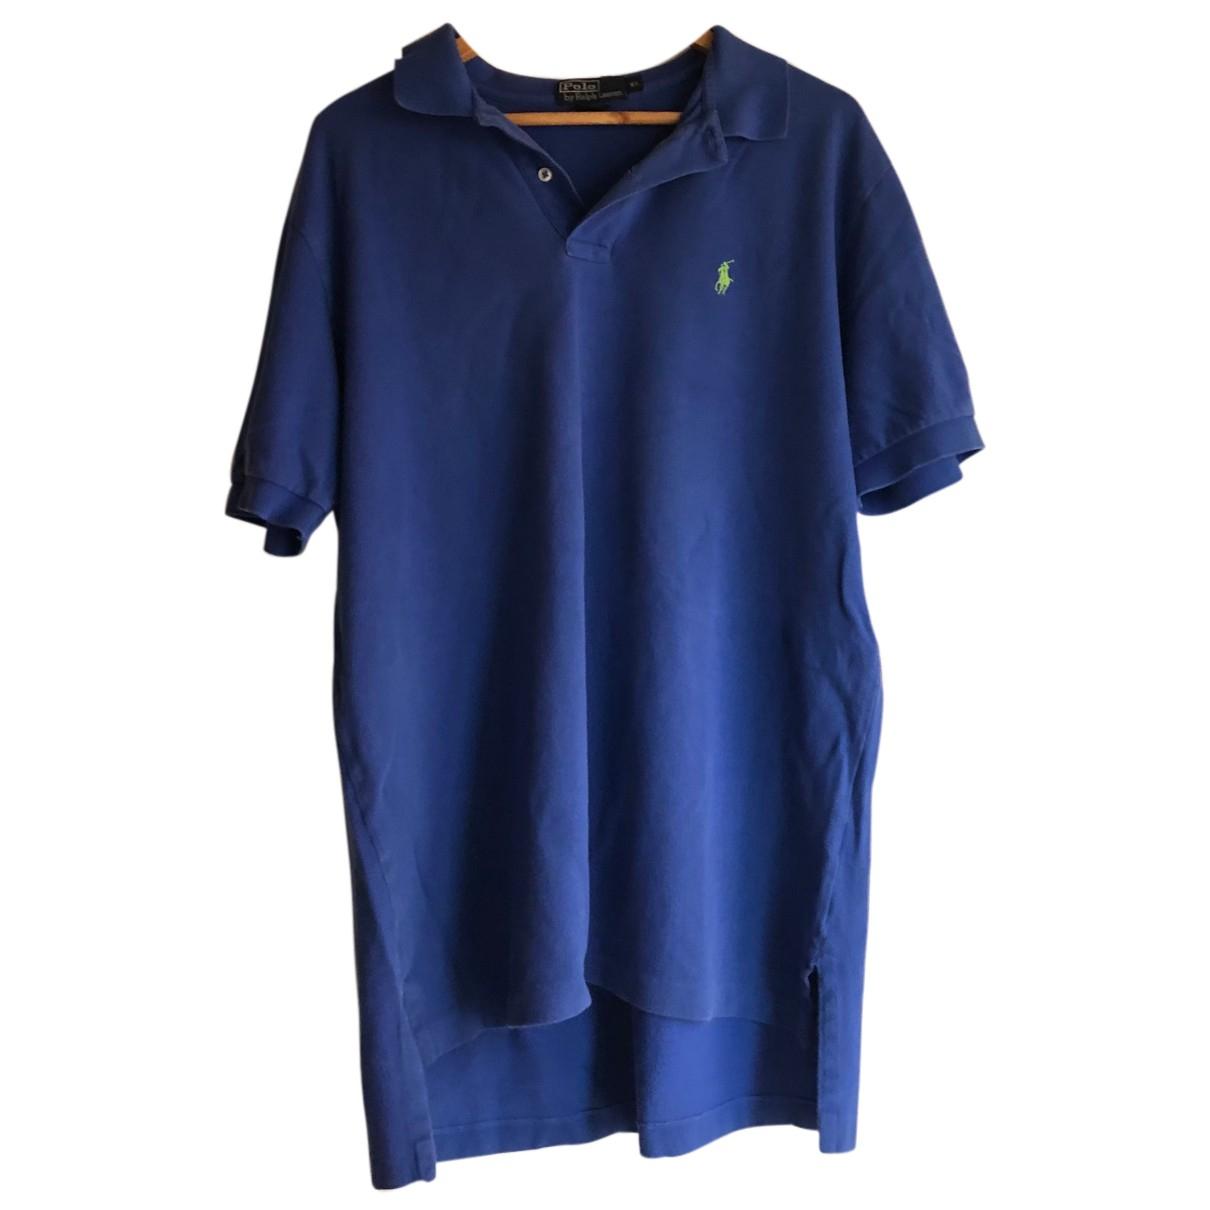 Polo Ralph Lauren Polo ajusté manches courtes Blue Cotton Polo shirts for Men XL International